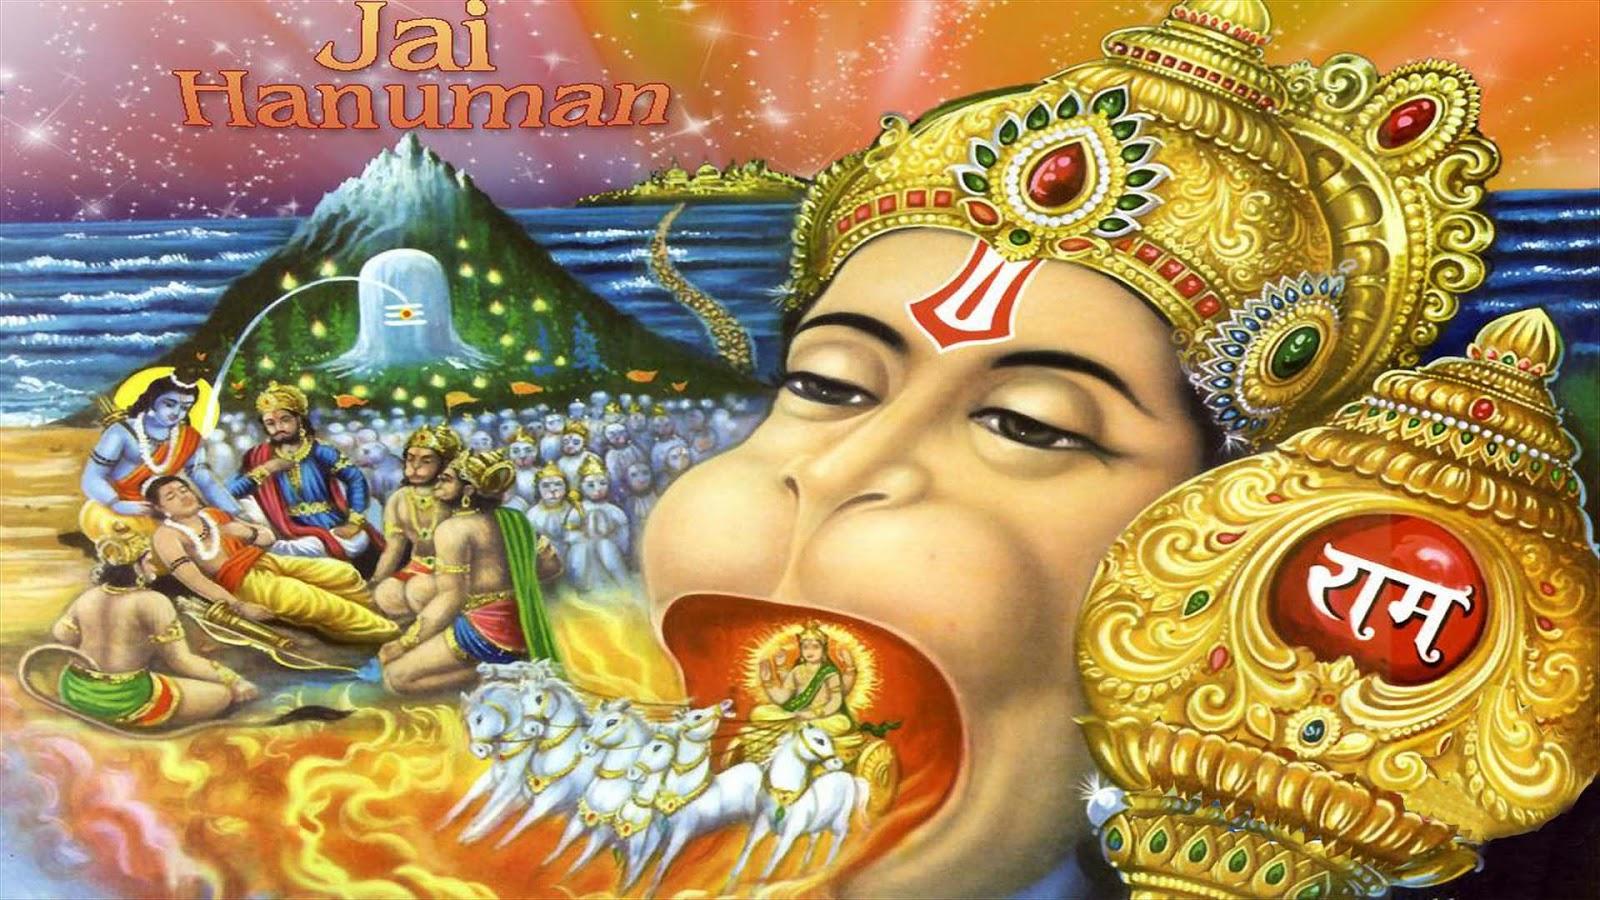 Wallpaper Hd New Hd Images Of Hanumanji Free Download